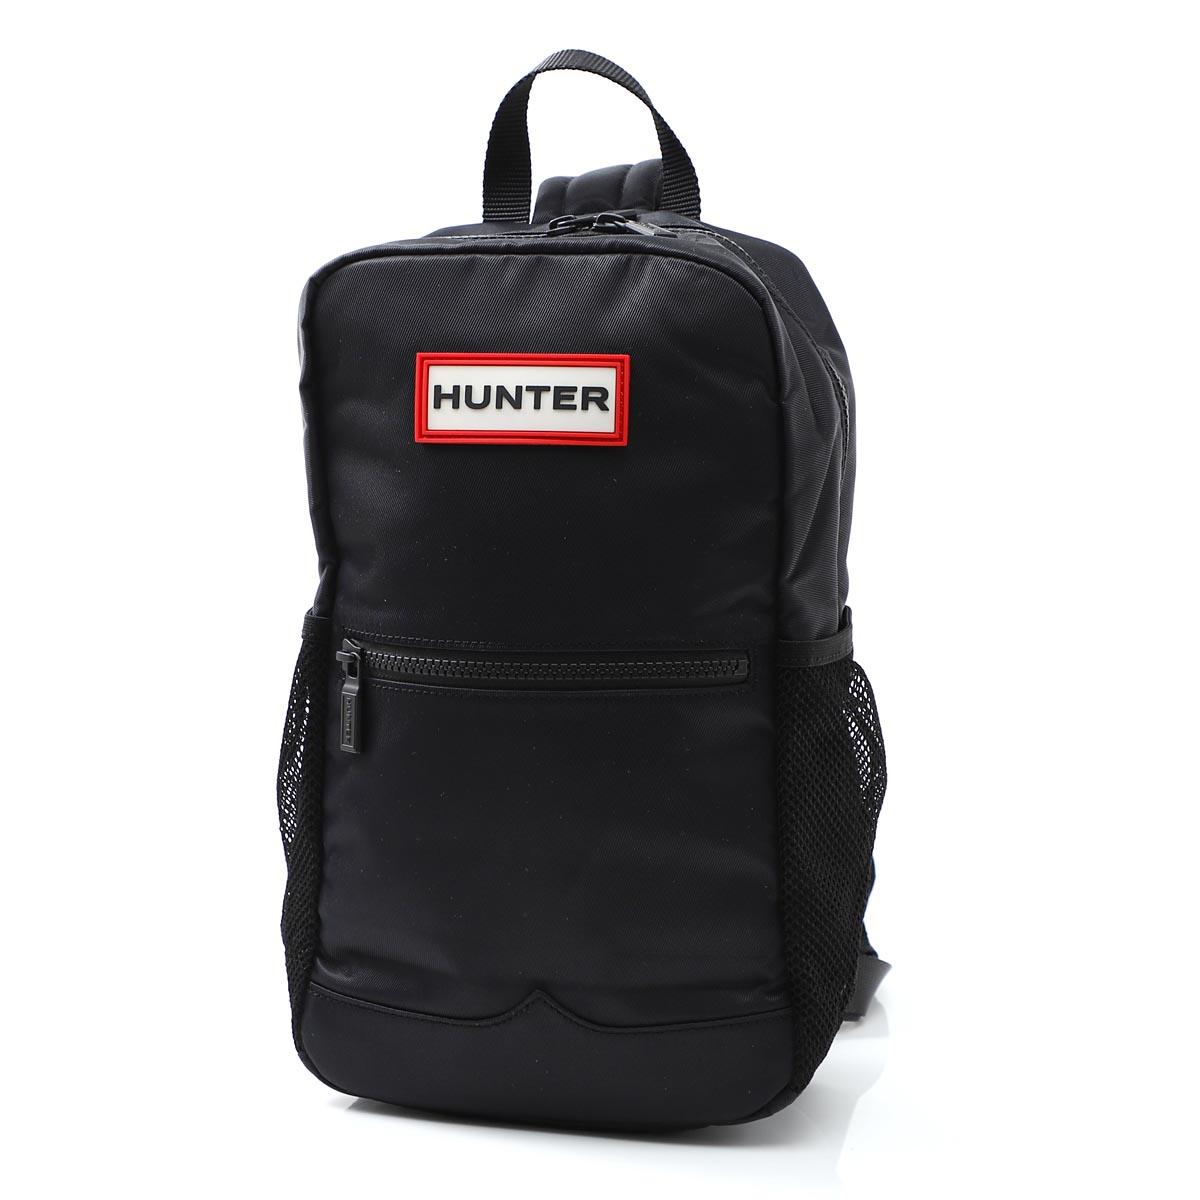 HUNTER ハンター クロスボディバッグ/ORIGINAL NYLON PORTRAIT CROSSBODY メンズ